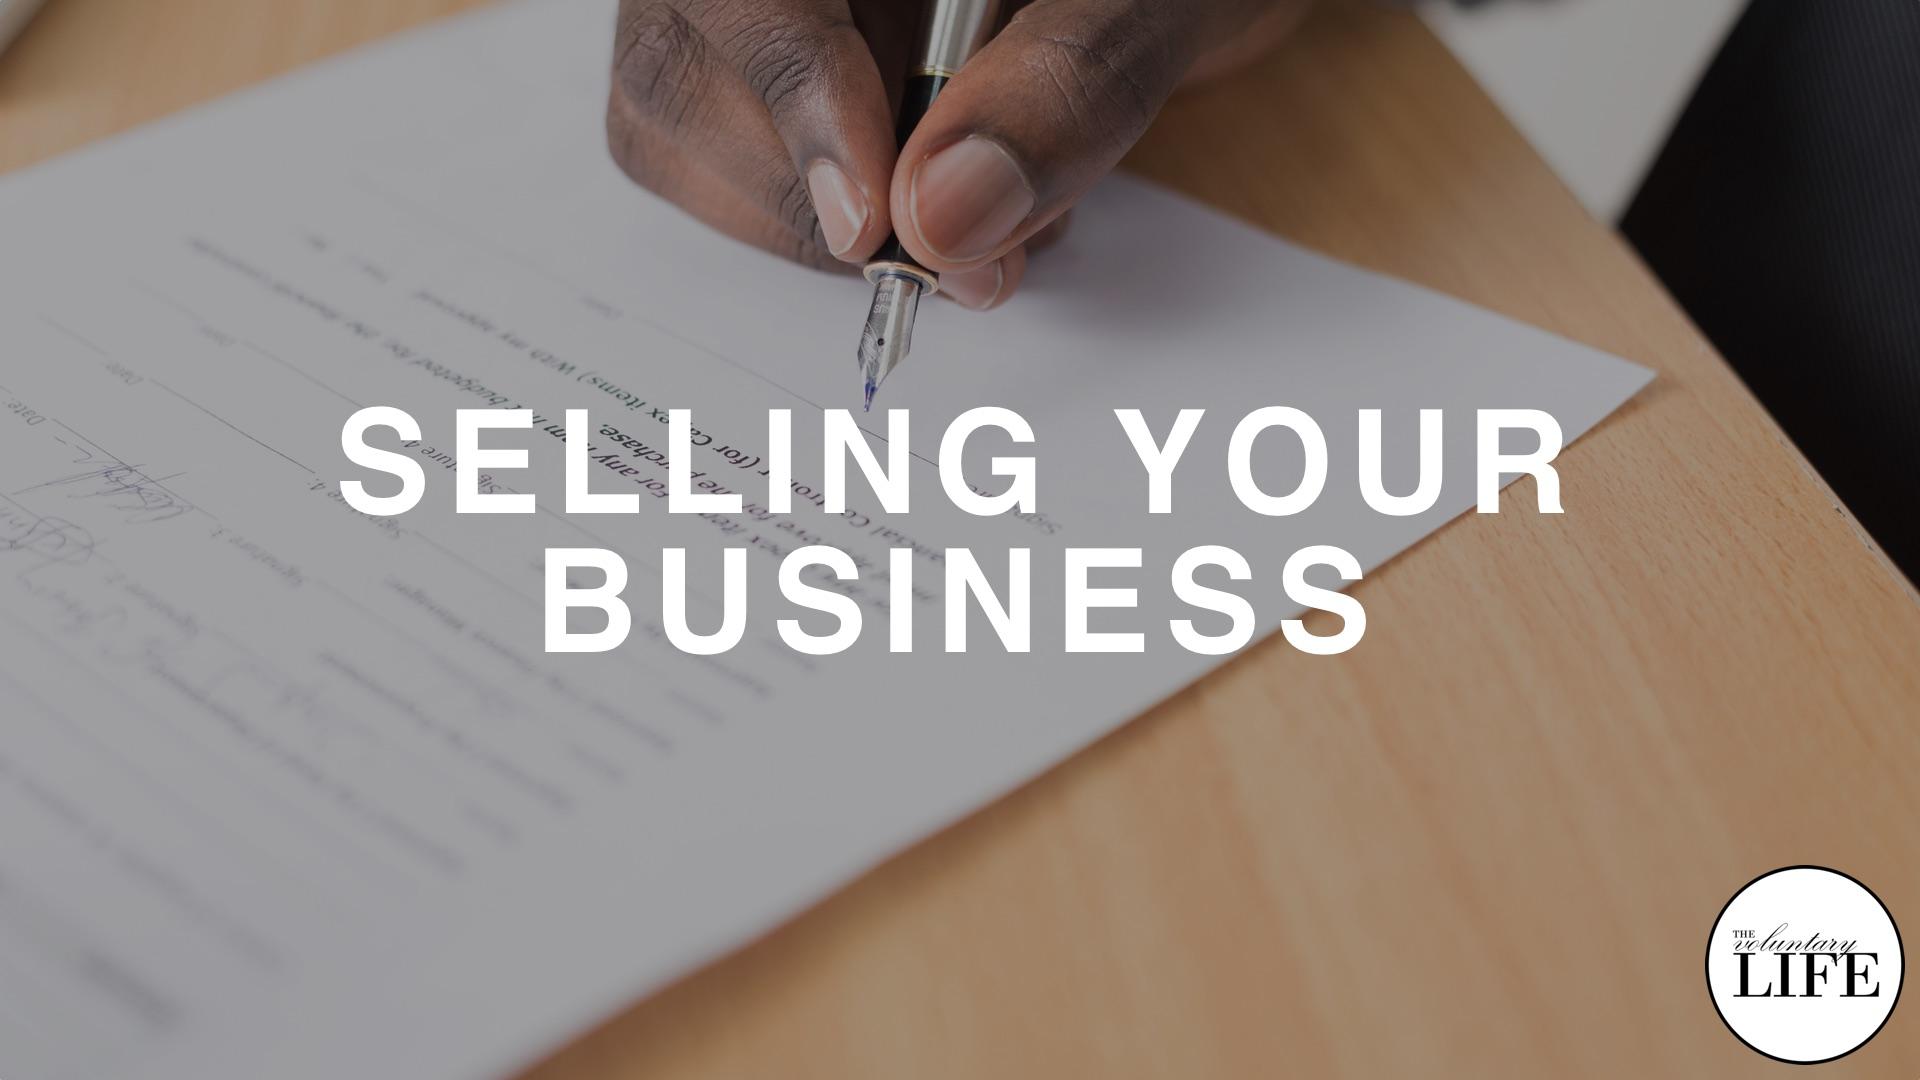 54 Entrepreneurship Part 8: Selling Your Business